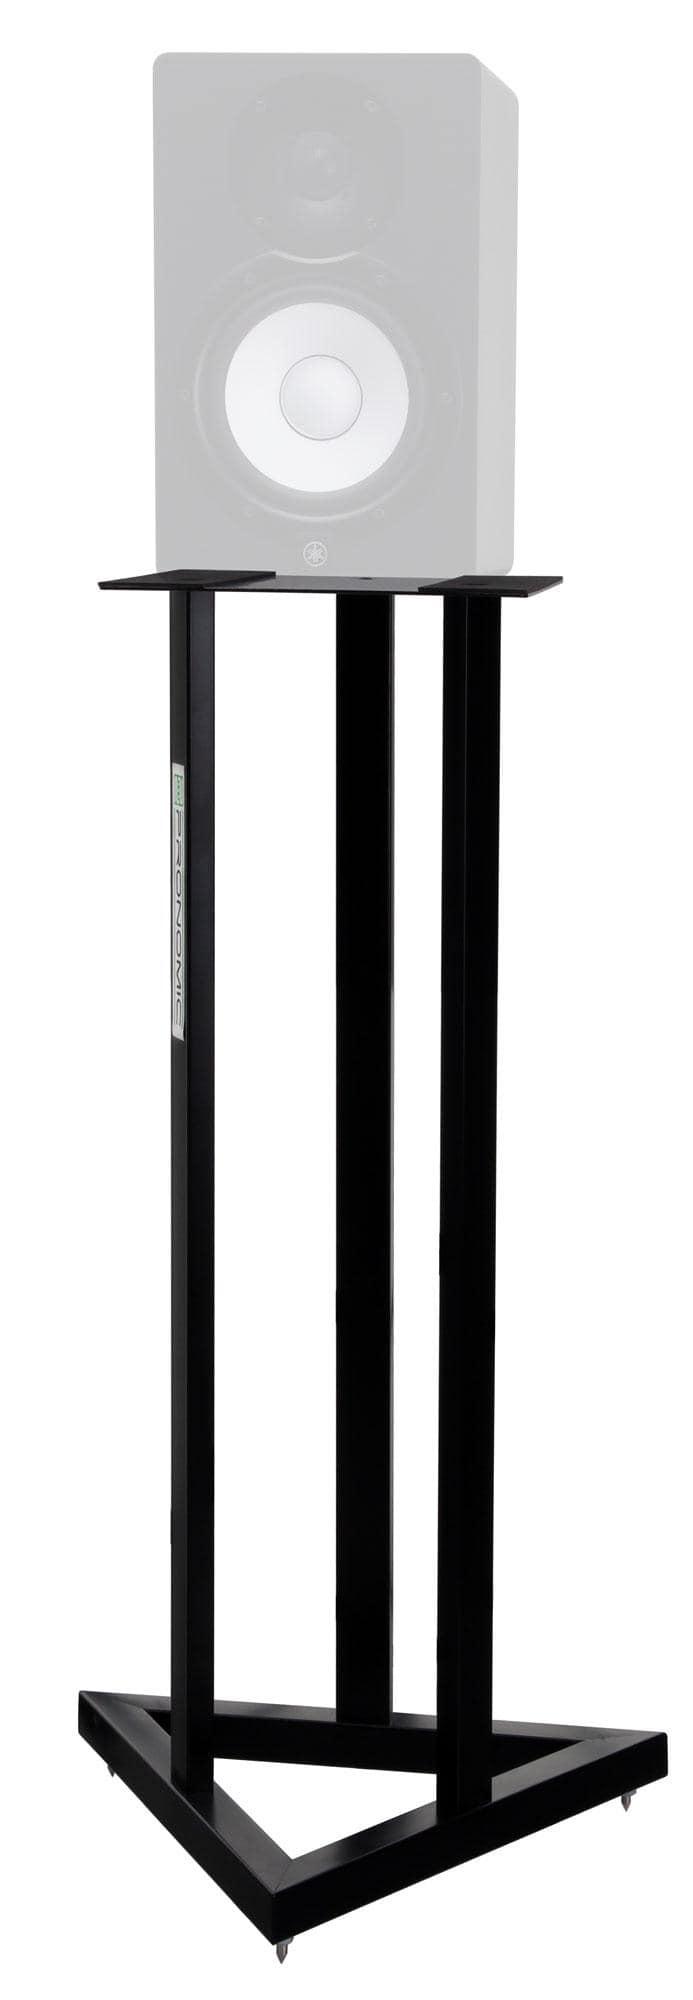 Pronomic Scs 20 Speaker Stand For Studio Monitor Pair Of